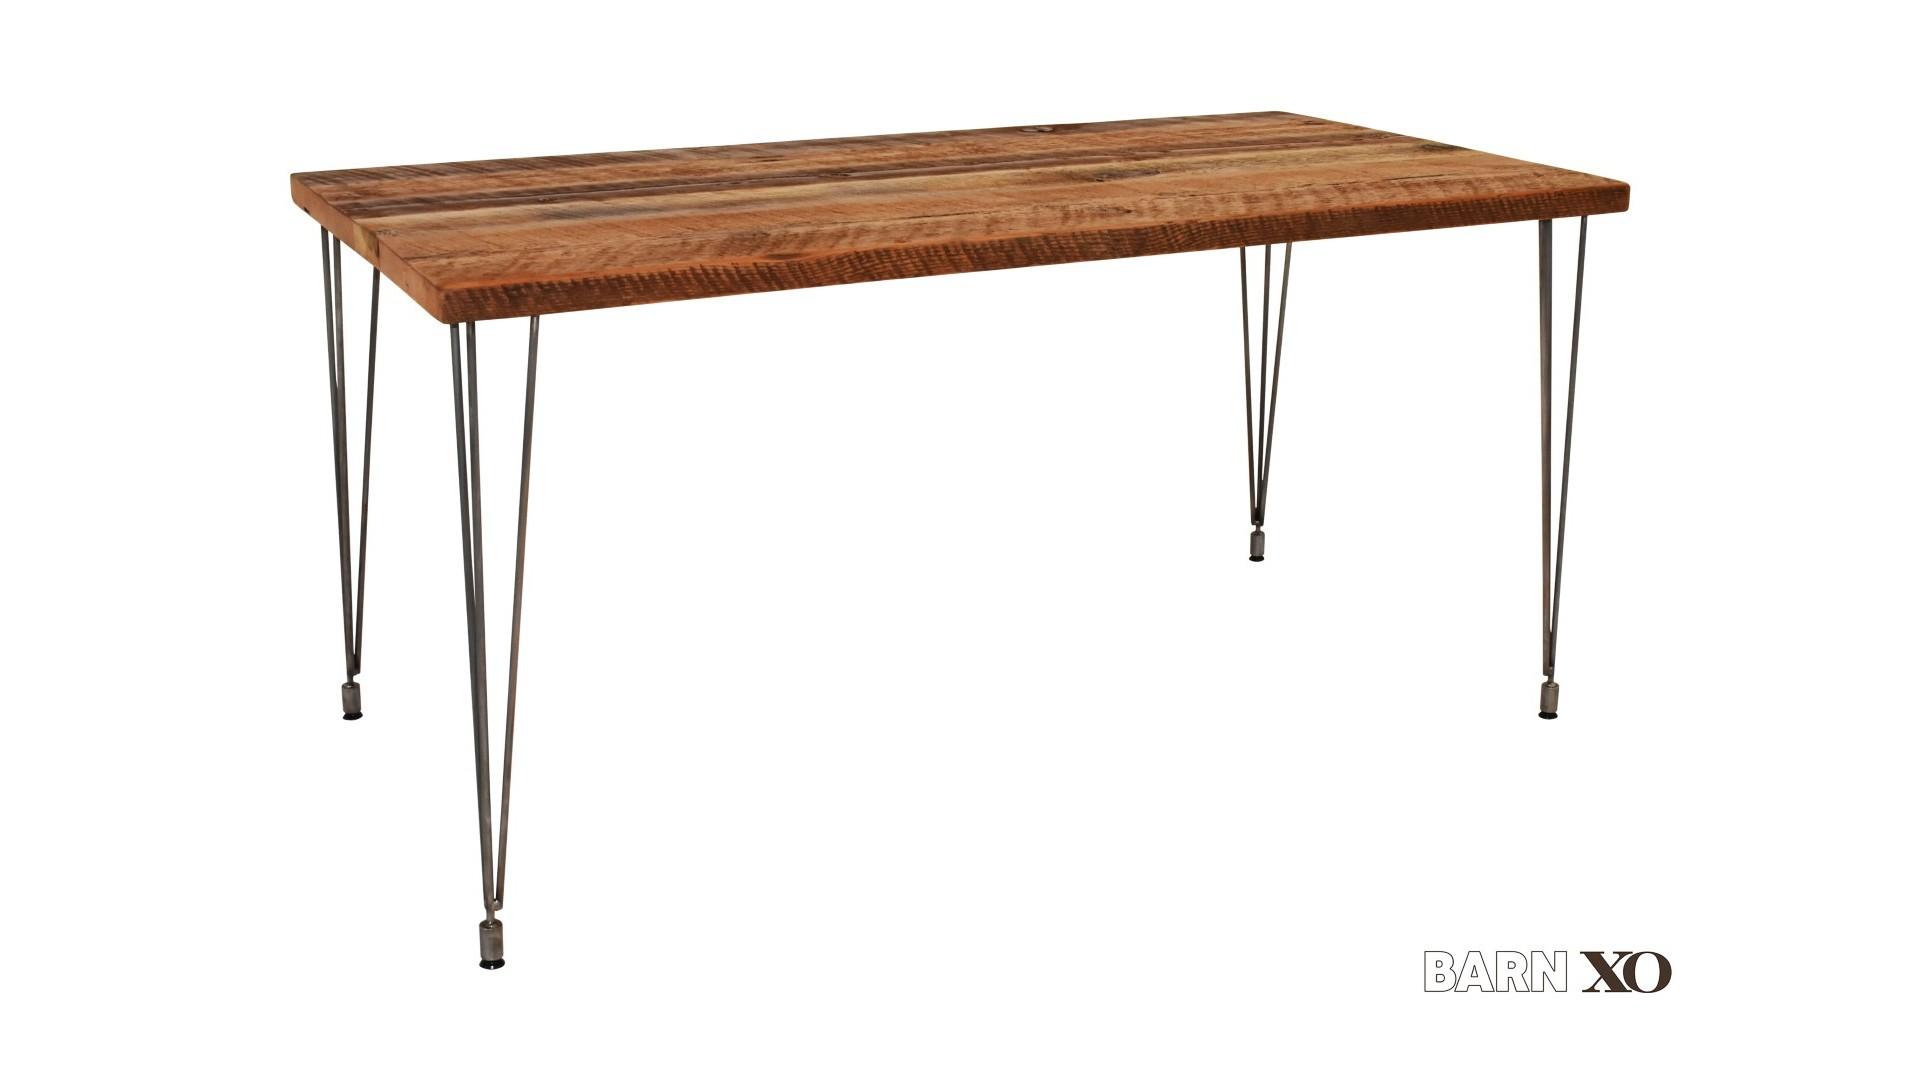 Barn Xo Desk With Leveling Hairpin Legs